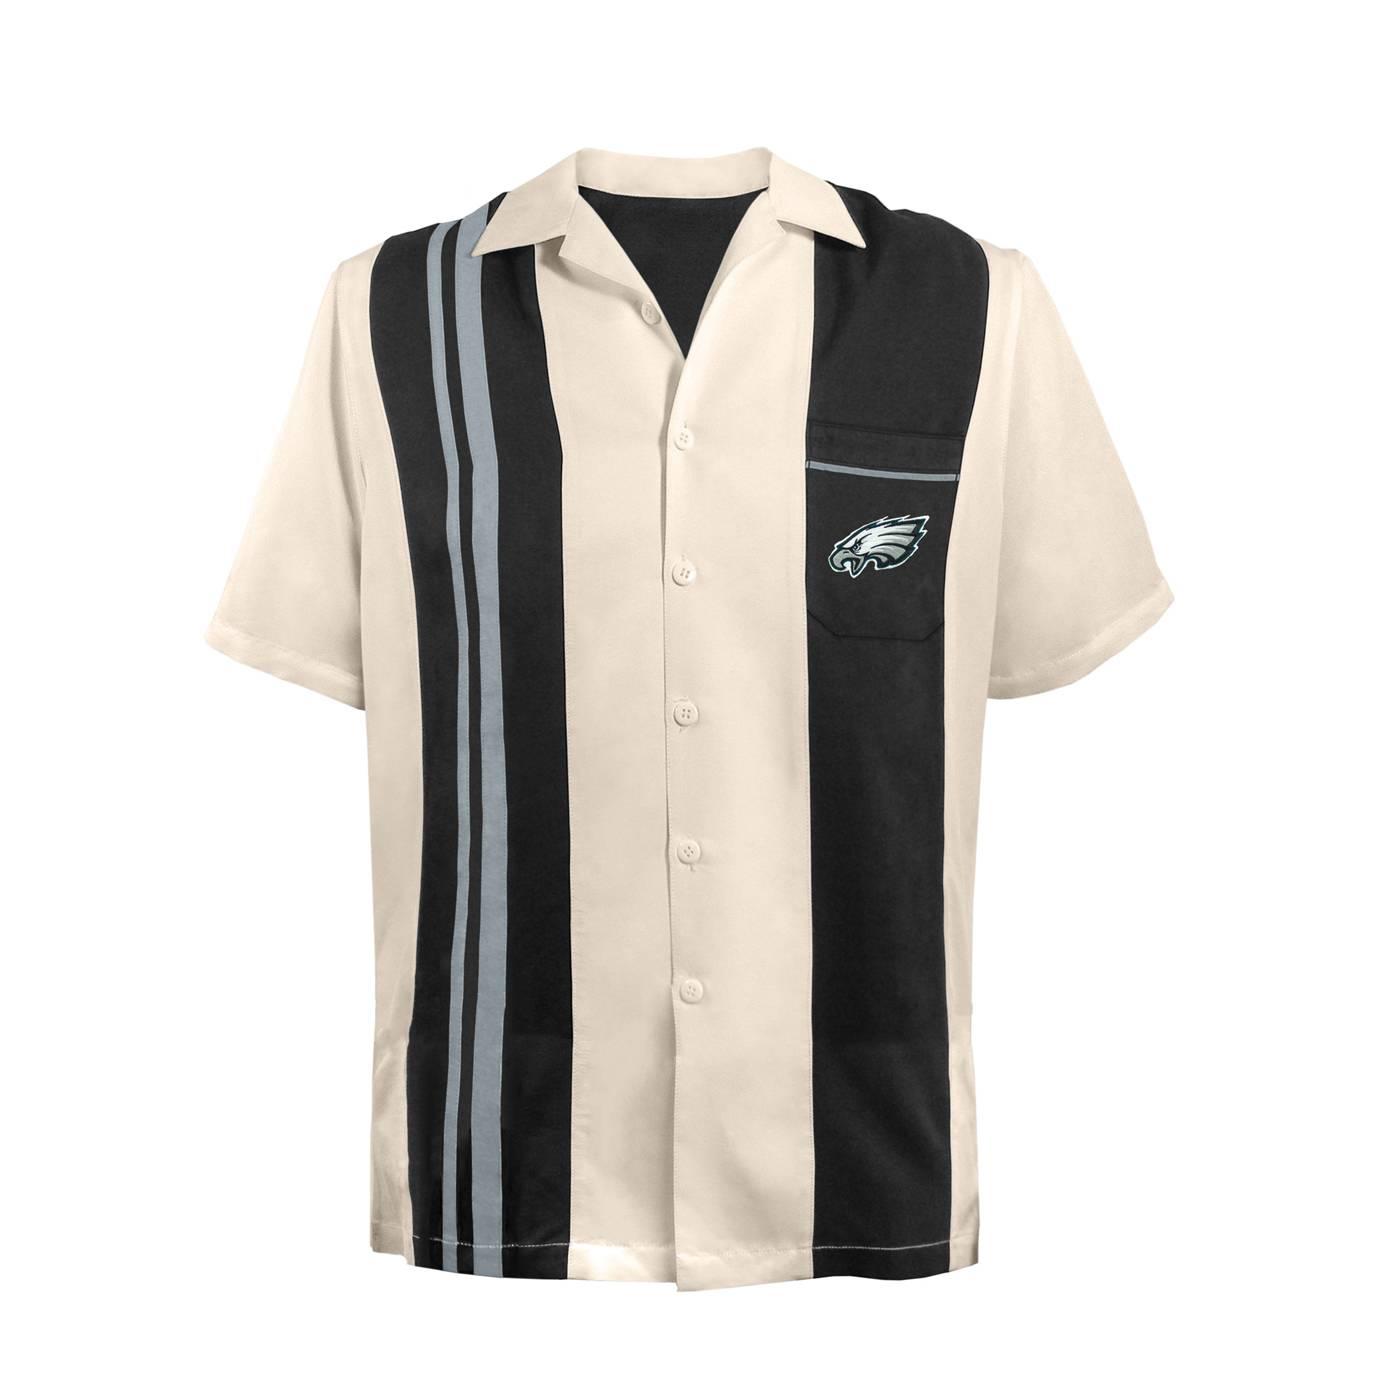 Philadelphia eagles bowling shirt spare